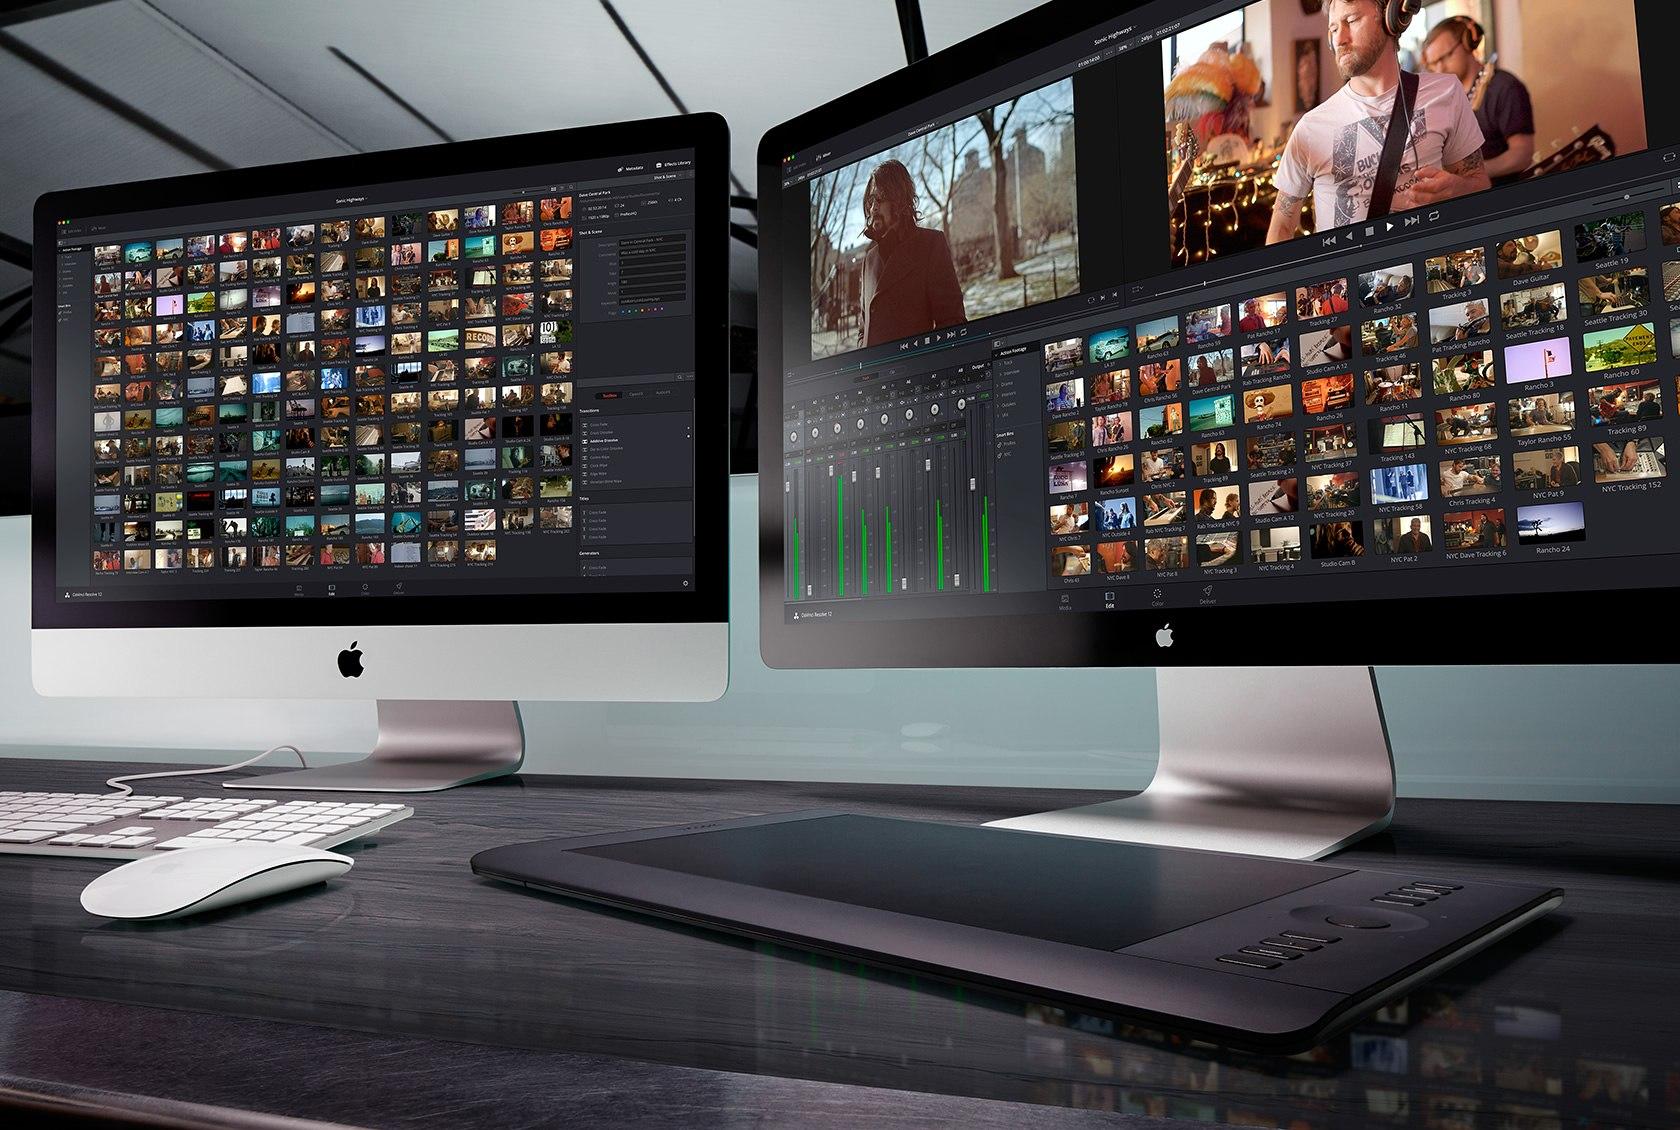 Blackmagic Design Announces Public Beta For Davinci Resolve 12 Animation World Network